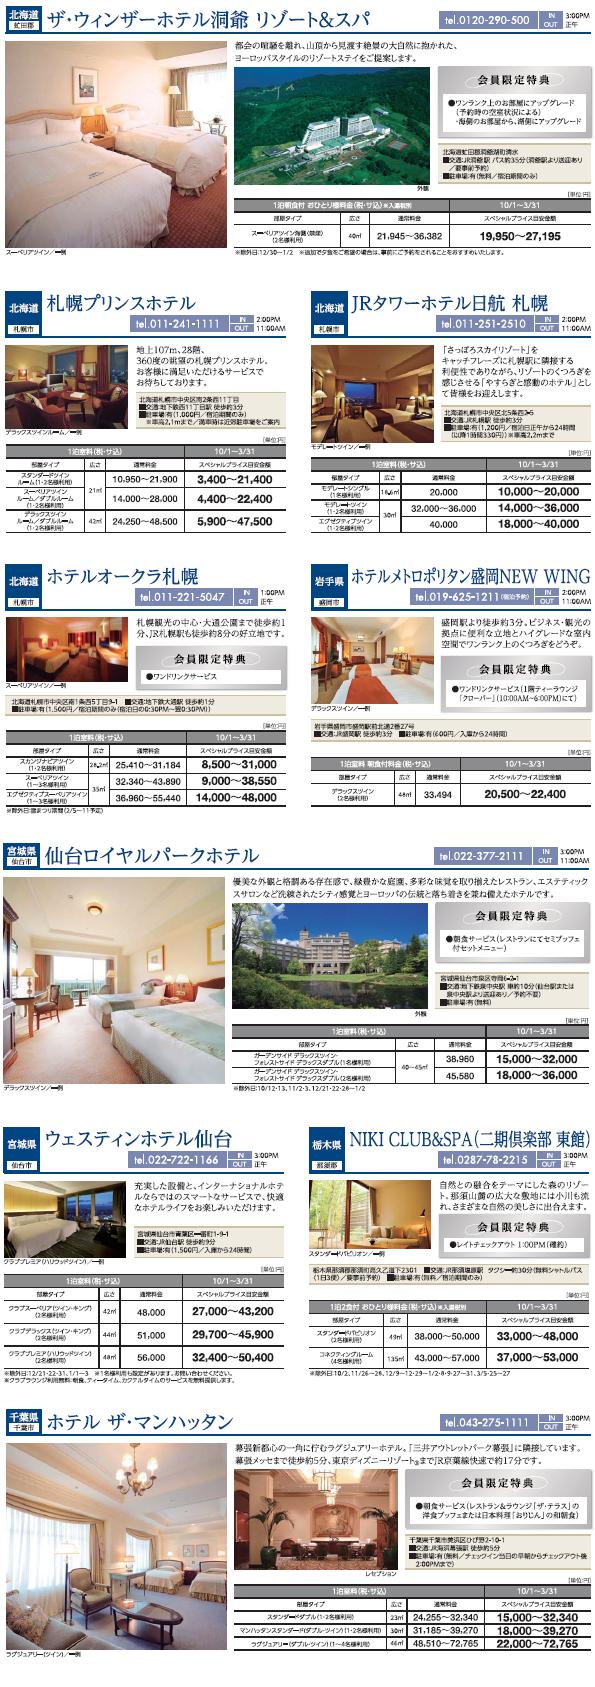 special_price_ plan1309 01